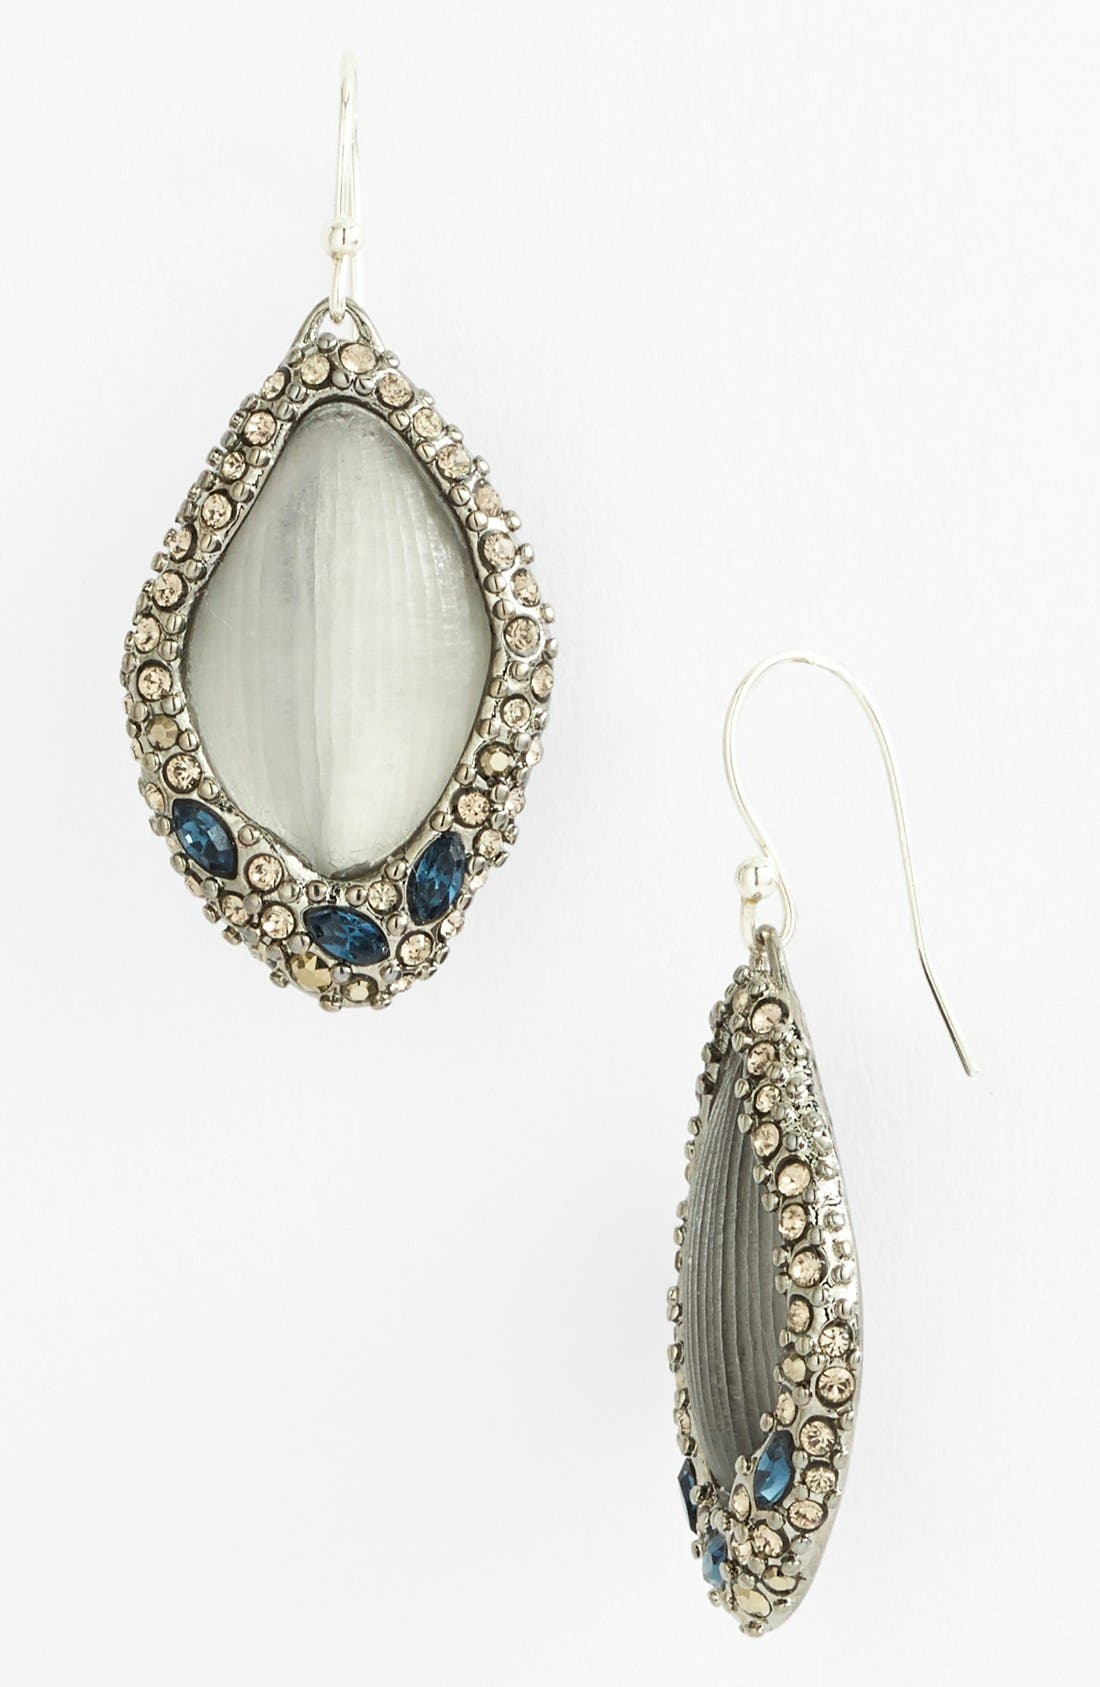 Alternate Image 1 Selected - Alexis Bittar 'Lucite® - Neo Bohemian' Drop Earrings